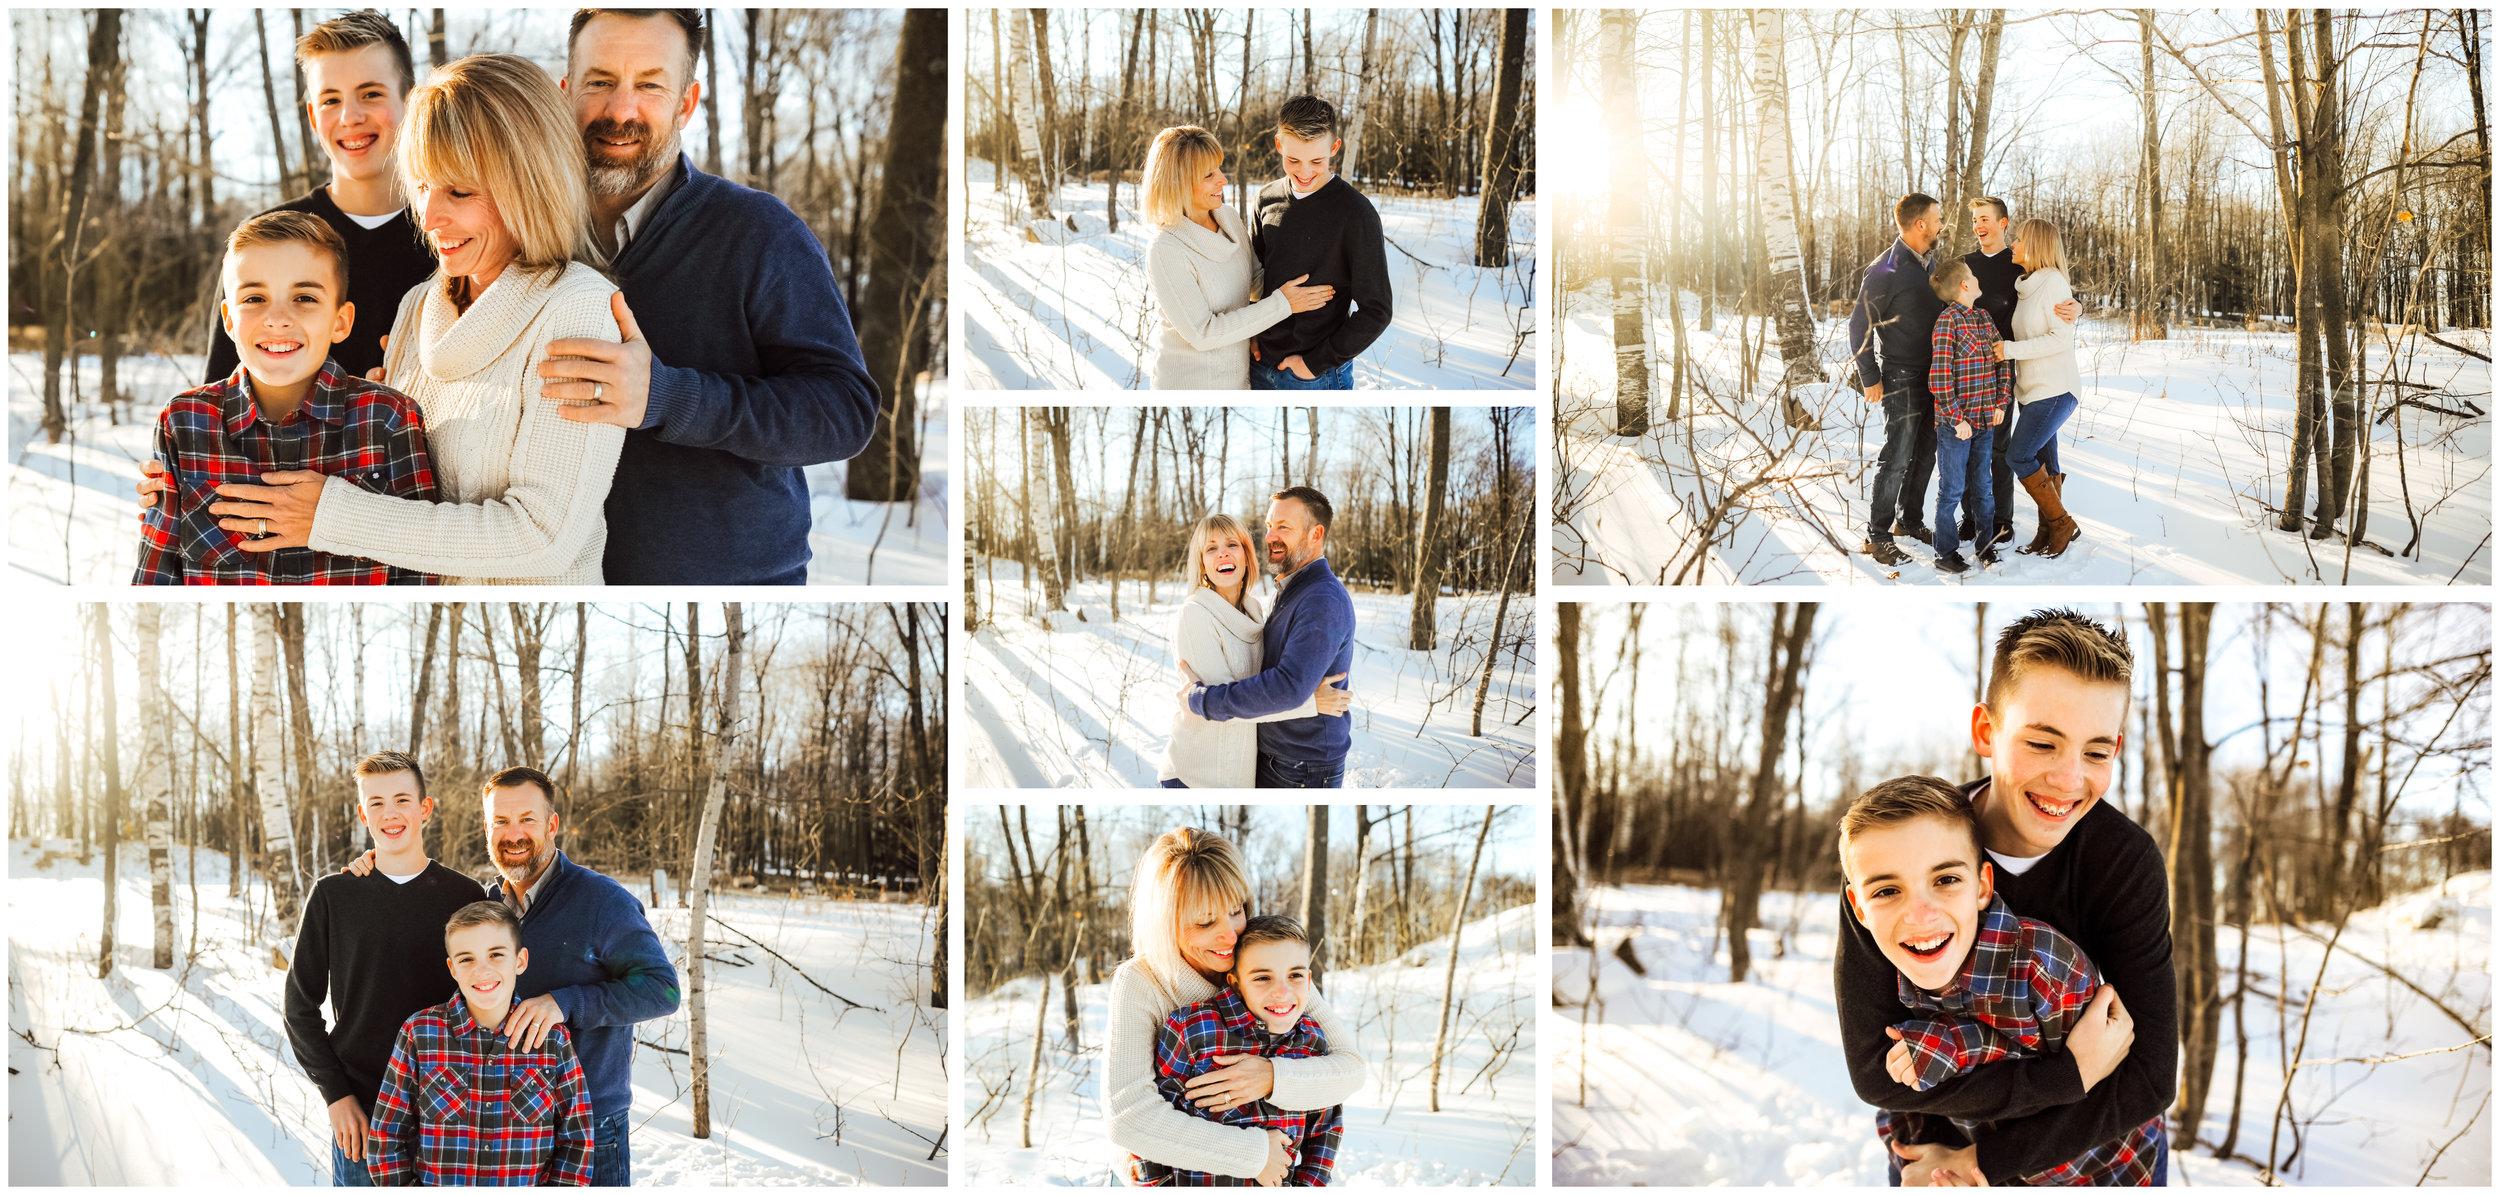 Kelly Jacobi Photography | Wausau Photographer Wausau Family Photographer Wausau Central Wisconsin Photographer Lightroom Collage Lightroom Collage templates